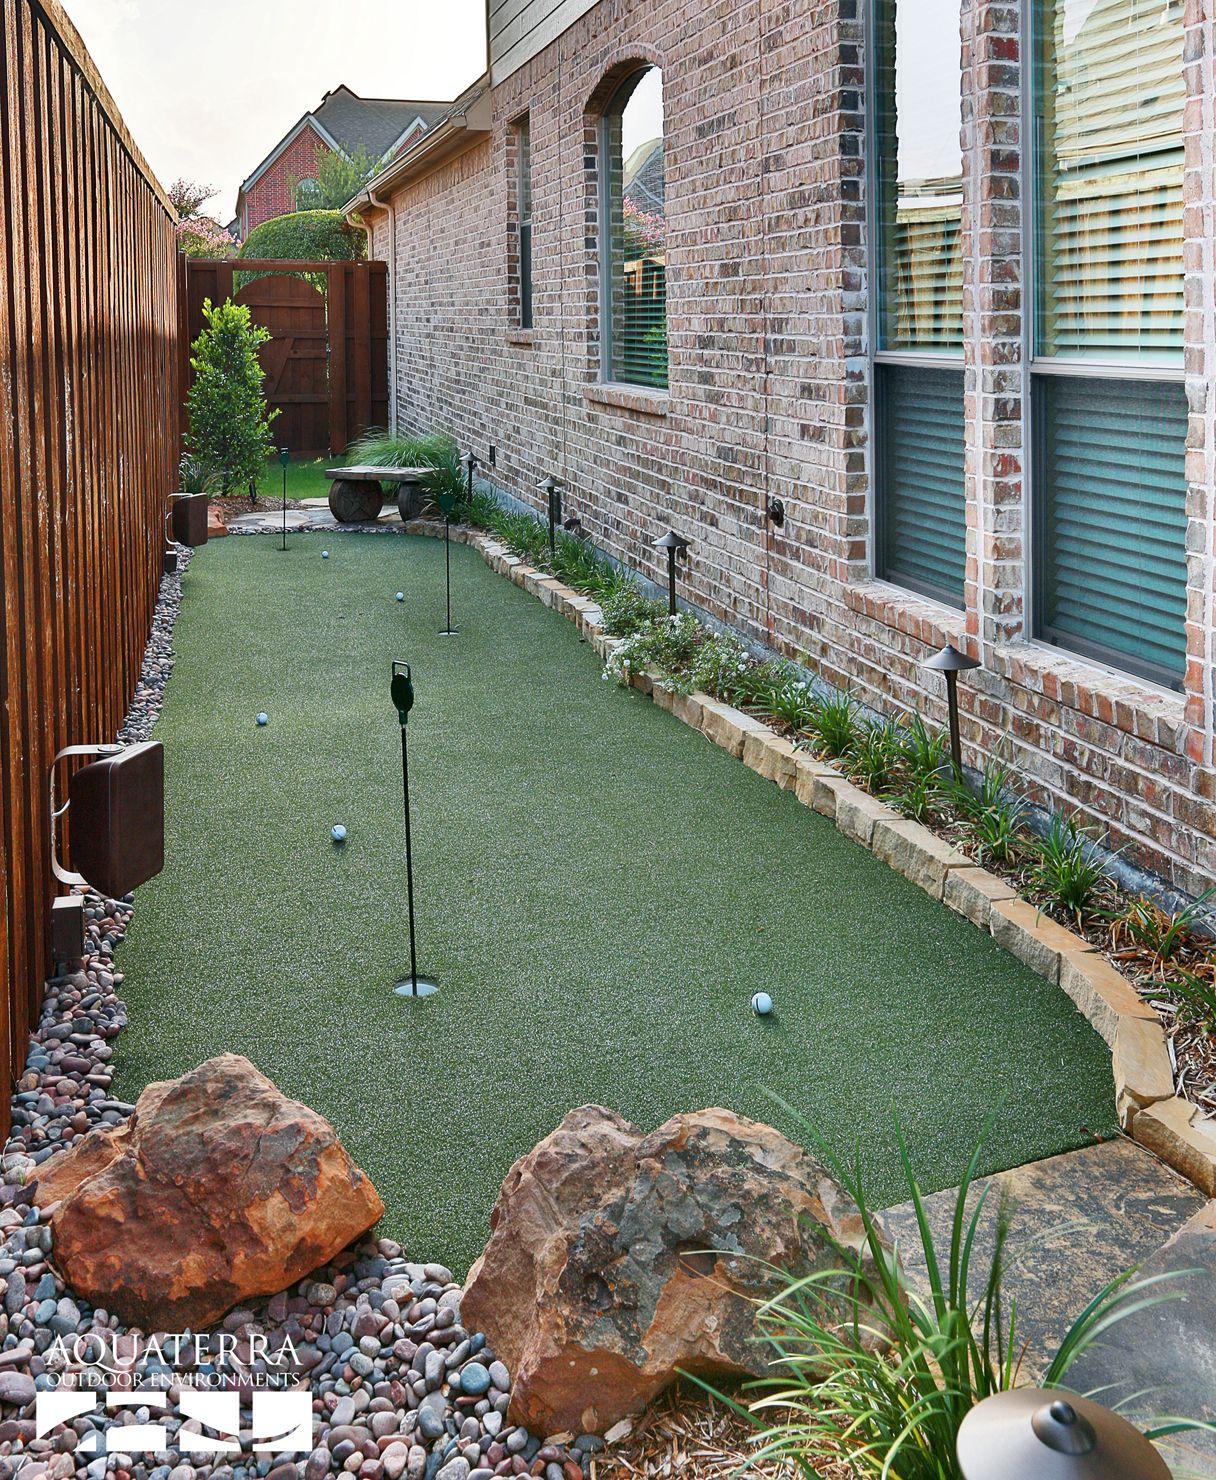 Backyard artificial putting green design and construction ... on Putting Green Ideas For Backyard id=40062